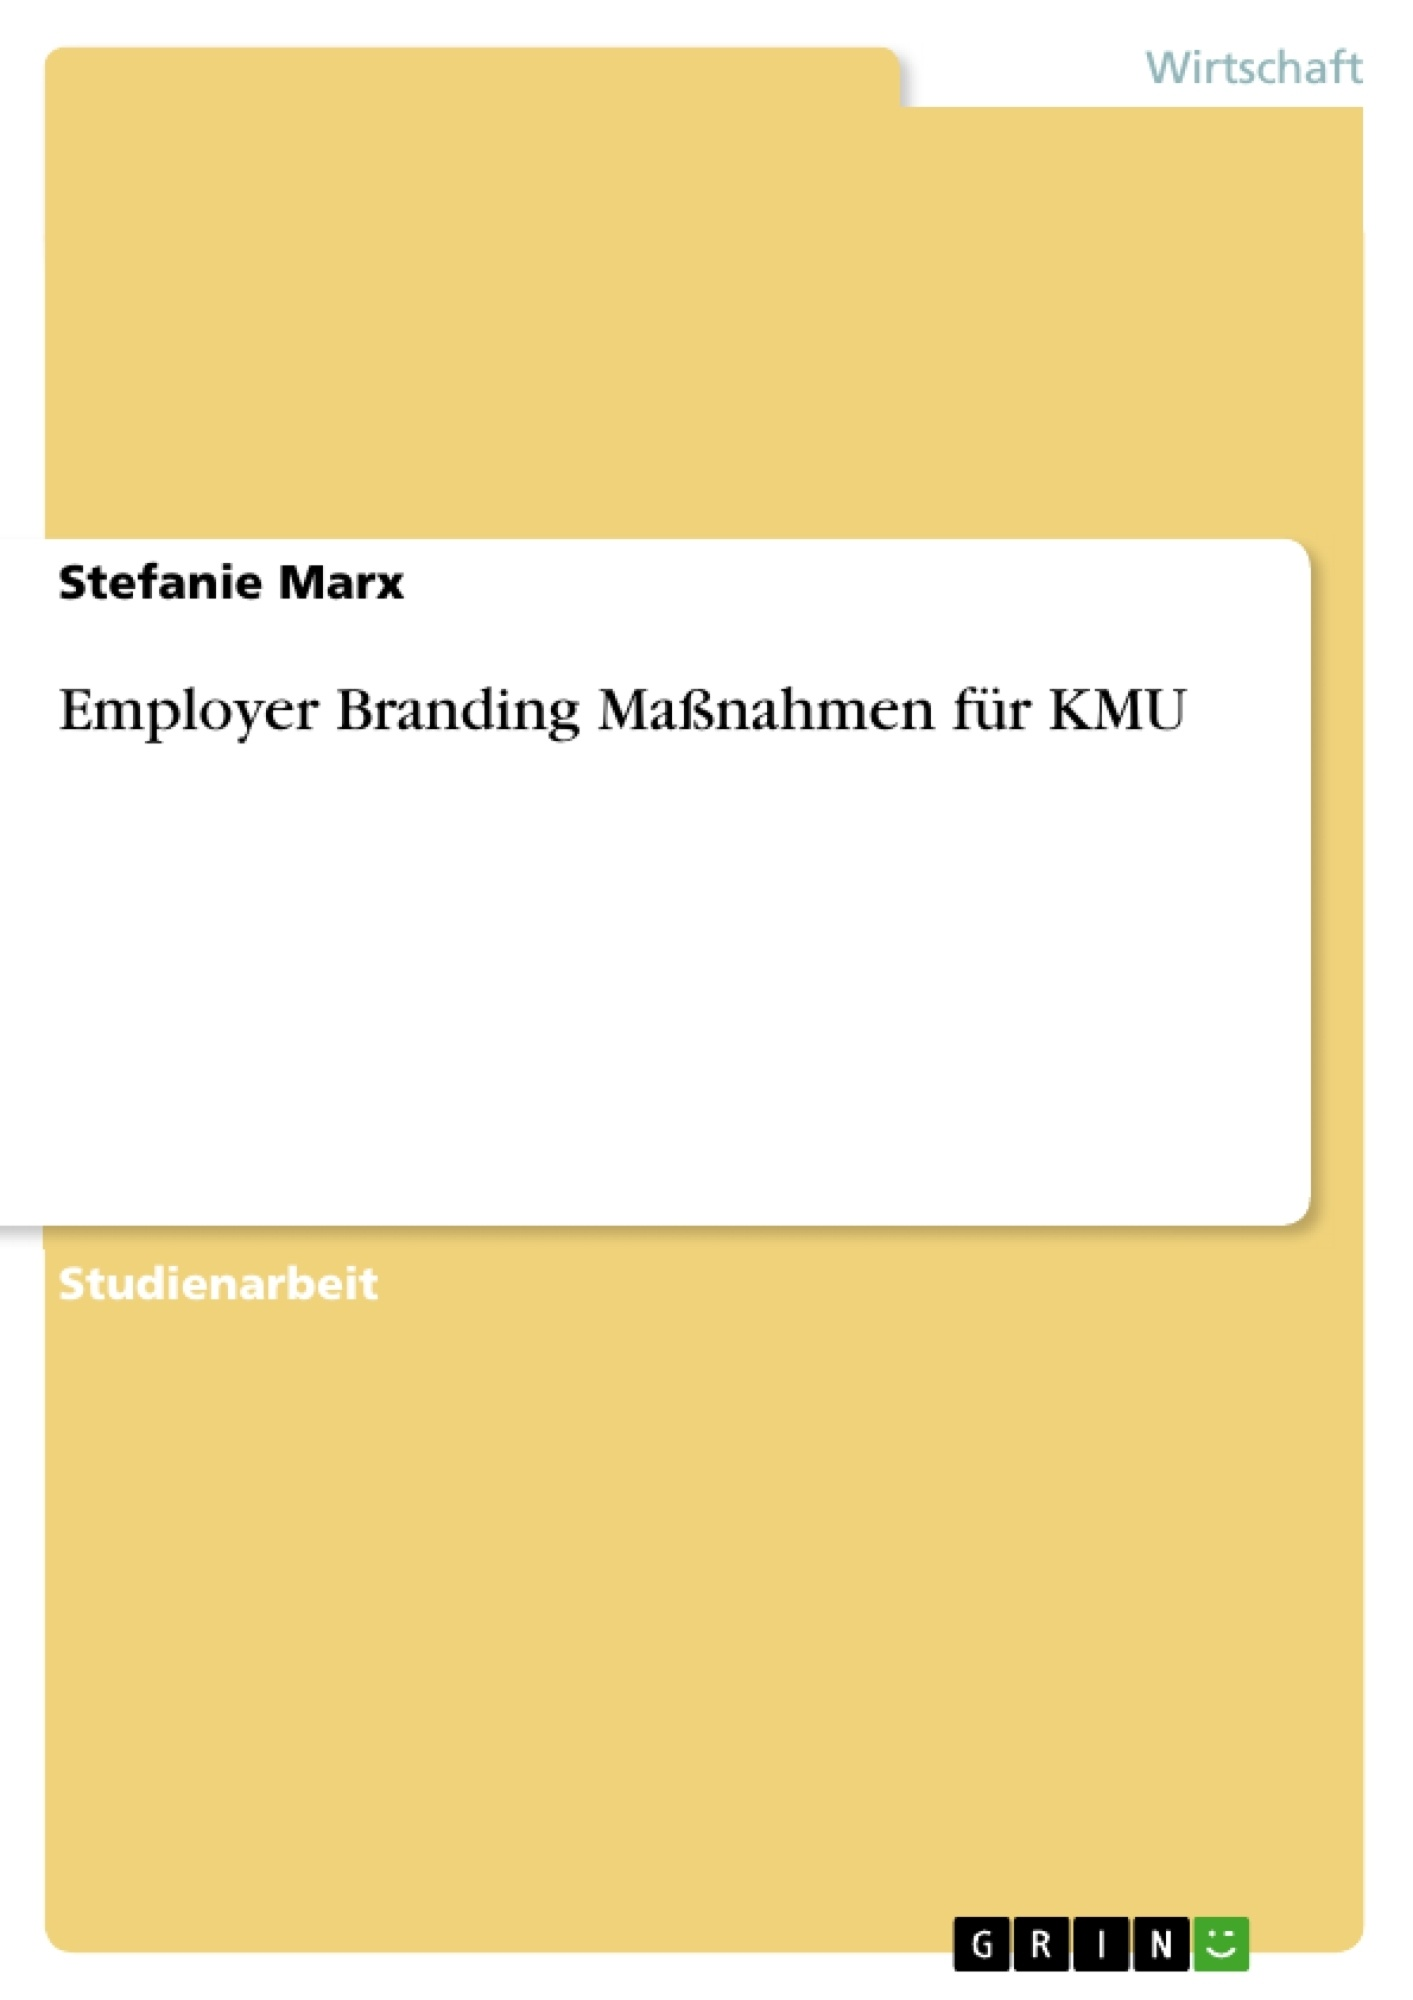 Titel: Employer Branding Maßnahmen für KMU